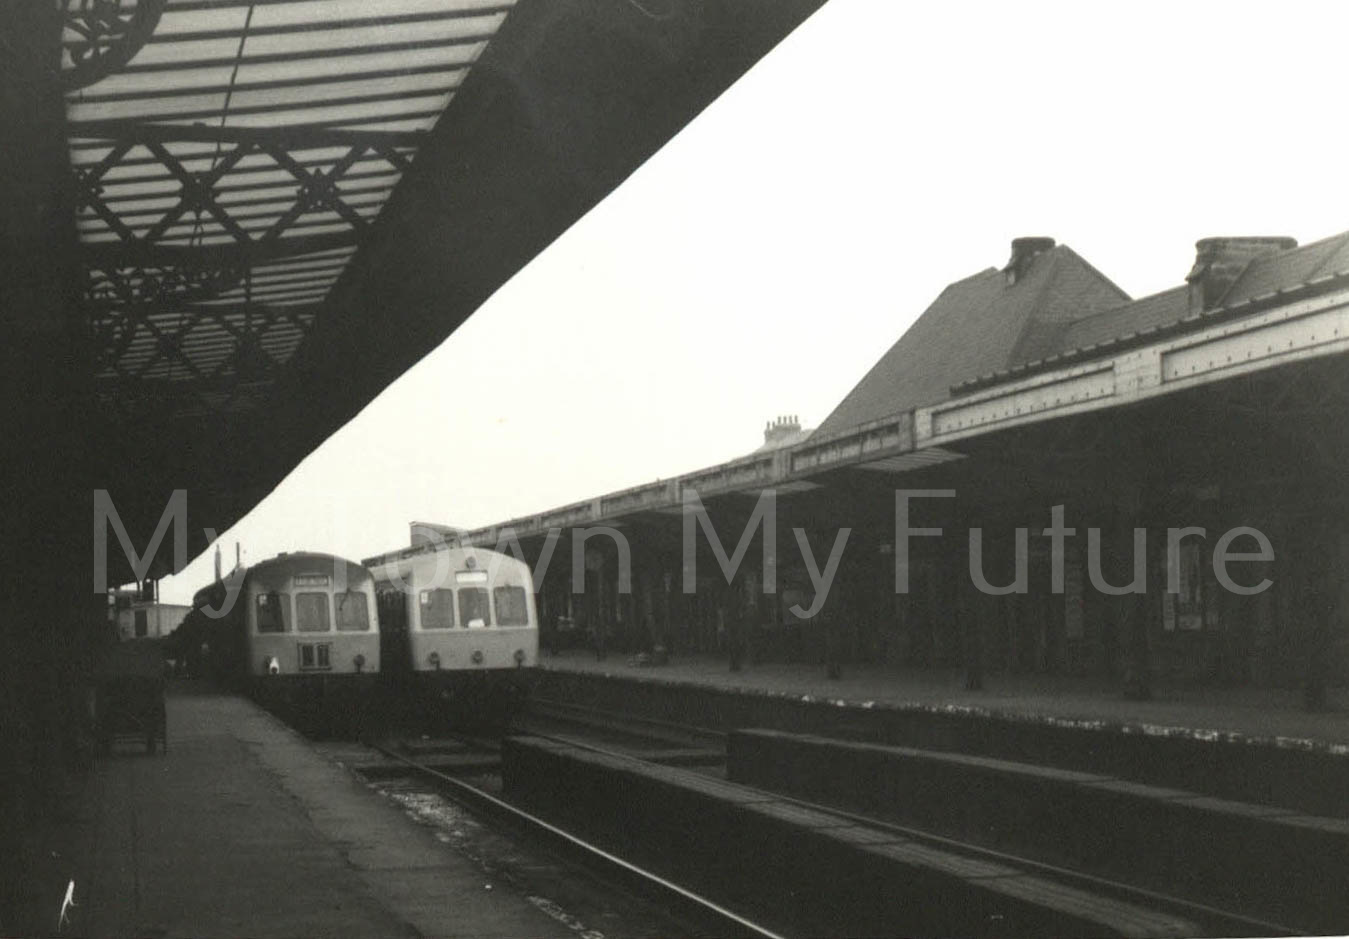 Middlesbrough Railway Station (1970)